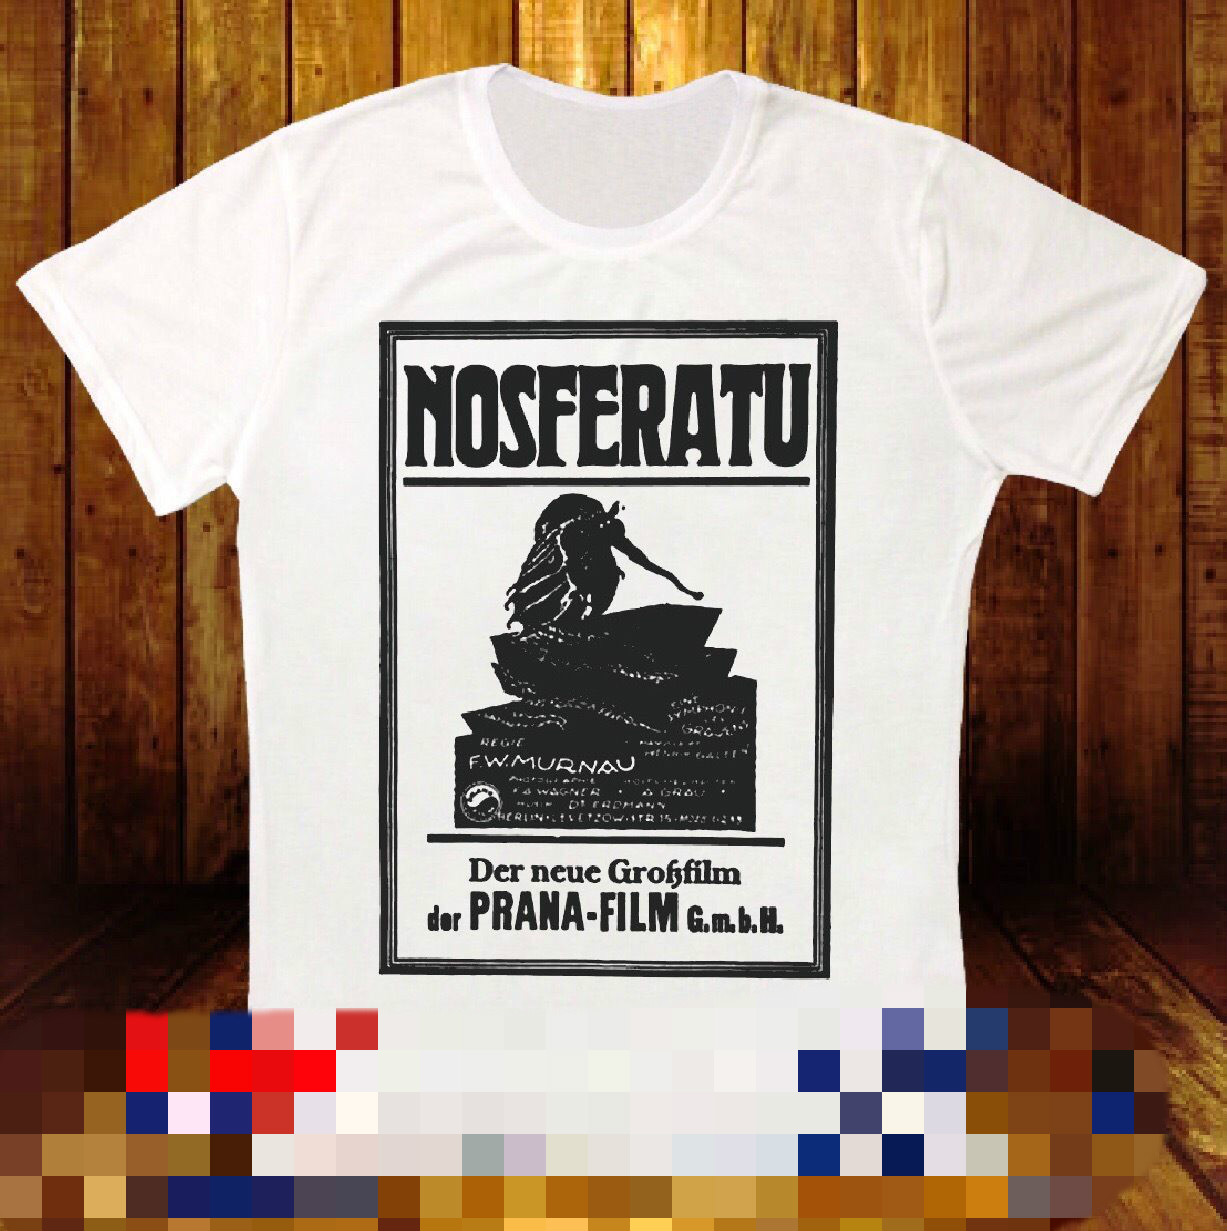 NOSFERATU EINE SYMPHONIE DES GRAUENS 1922 FILM RETRO VINTAGE UNISEX T SHIRT 759 Retro 100% Cotton Print Shirt Tee Tatoo Lover